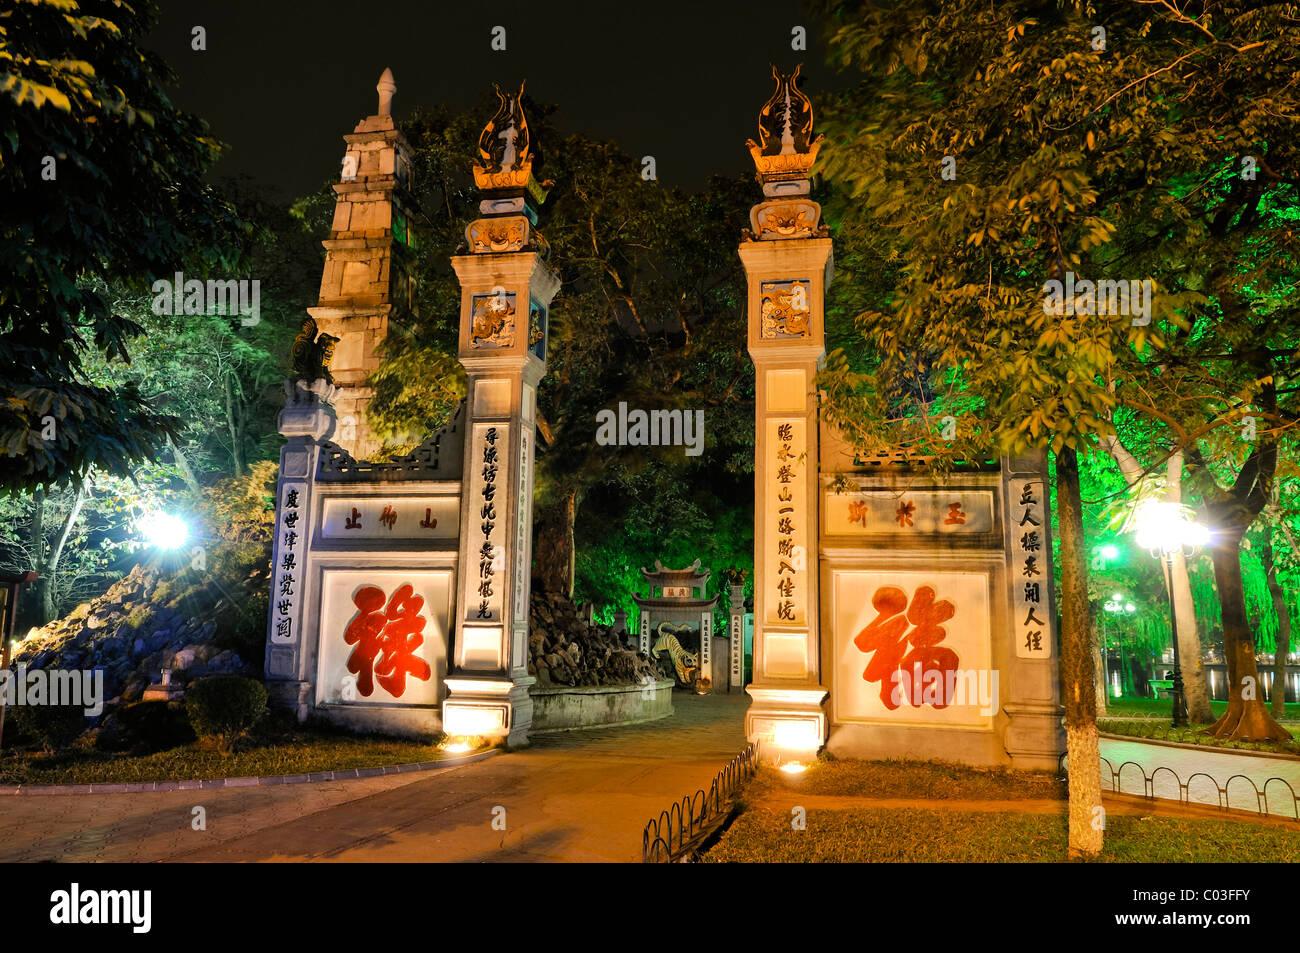 Entrance to the Red Bridge, Hoan Kiem Lake, Hanoi, Vietnam, Southeast Asia - Stock Image